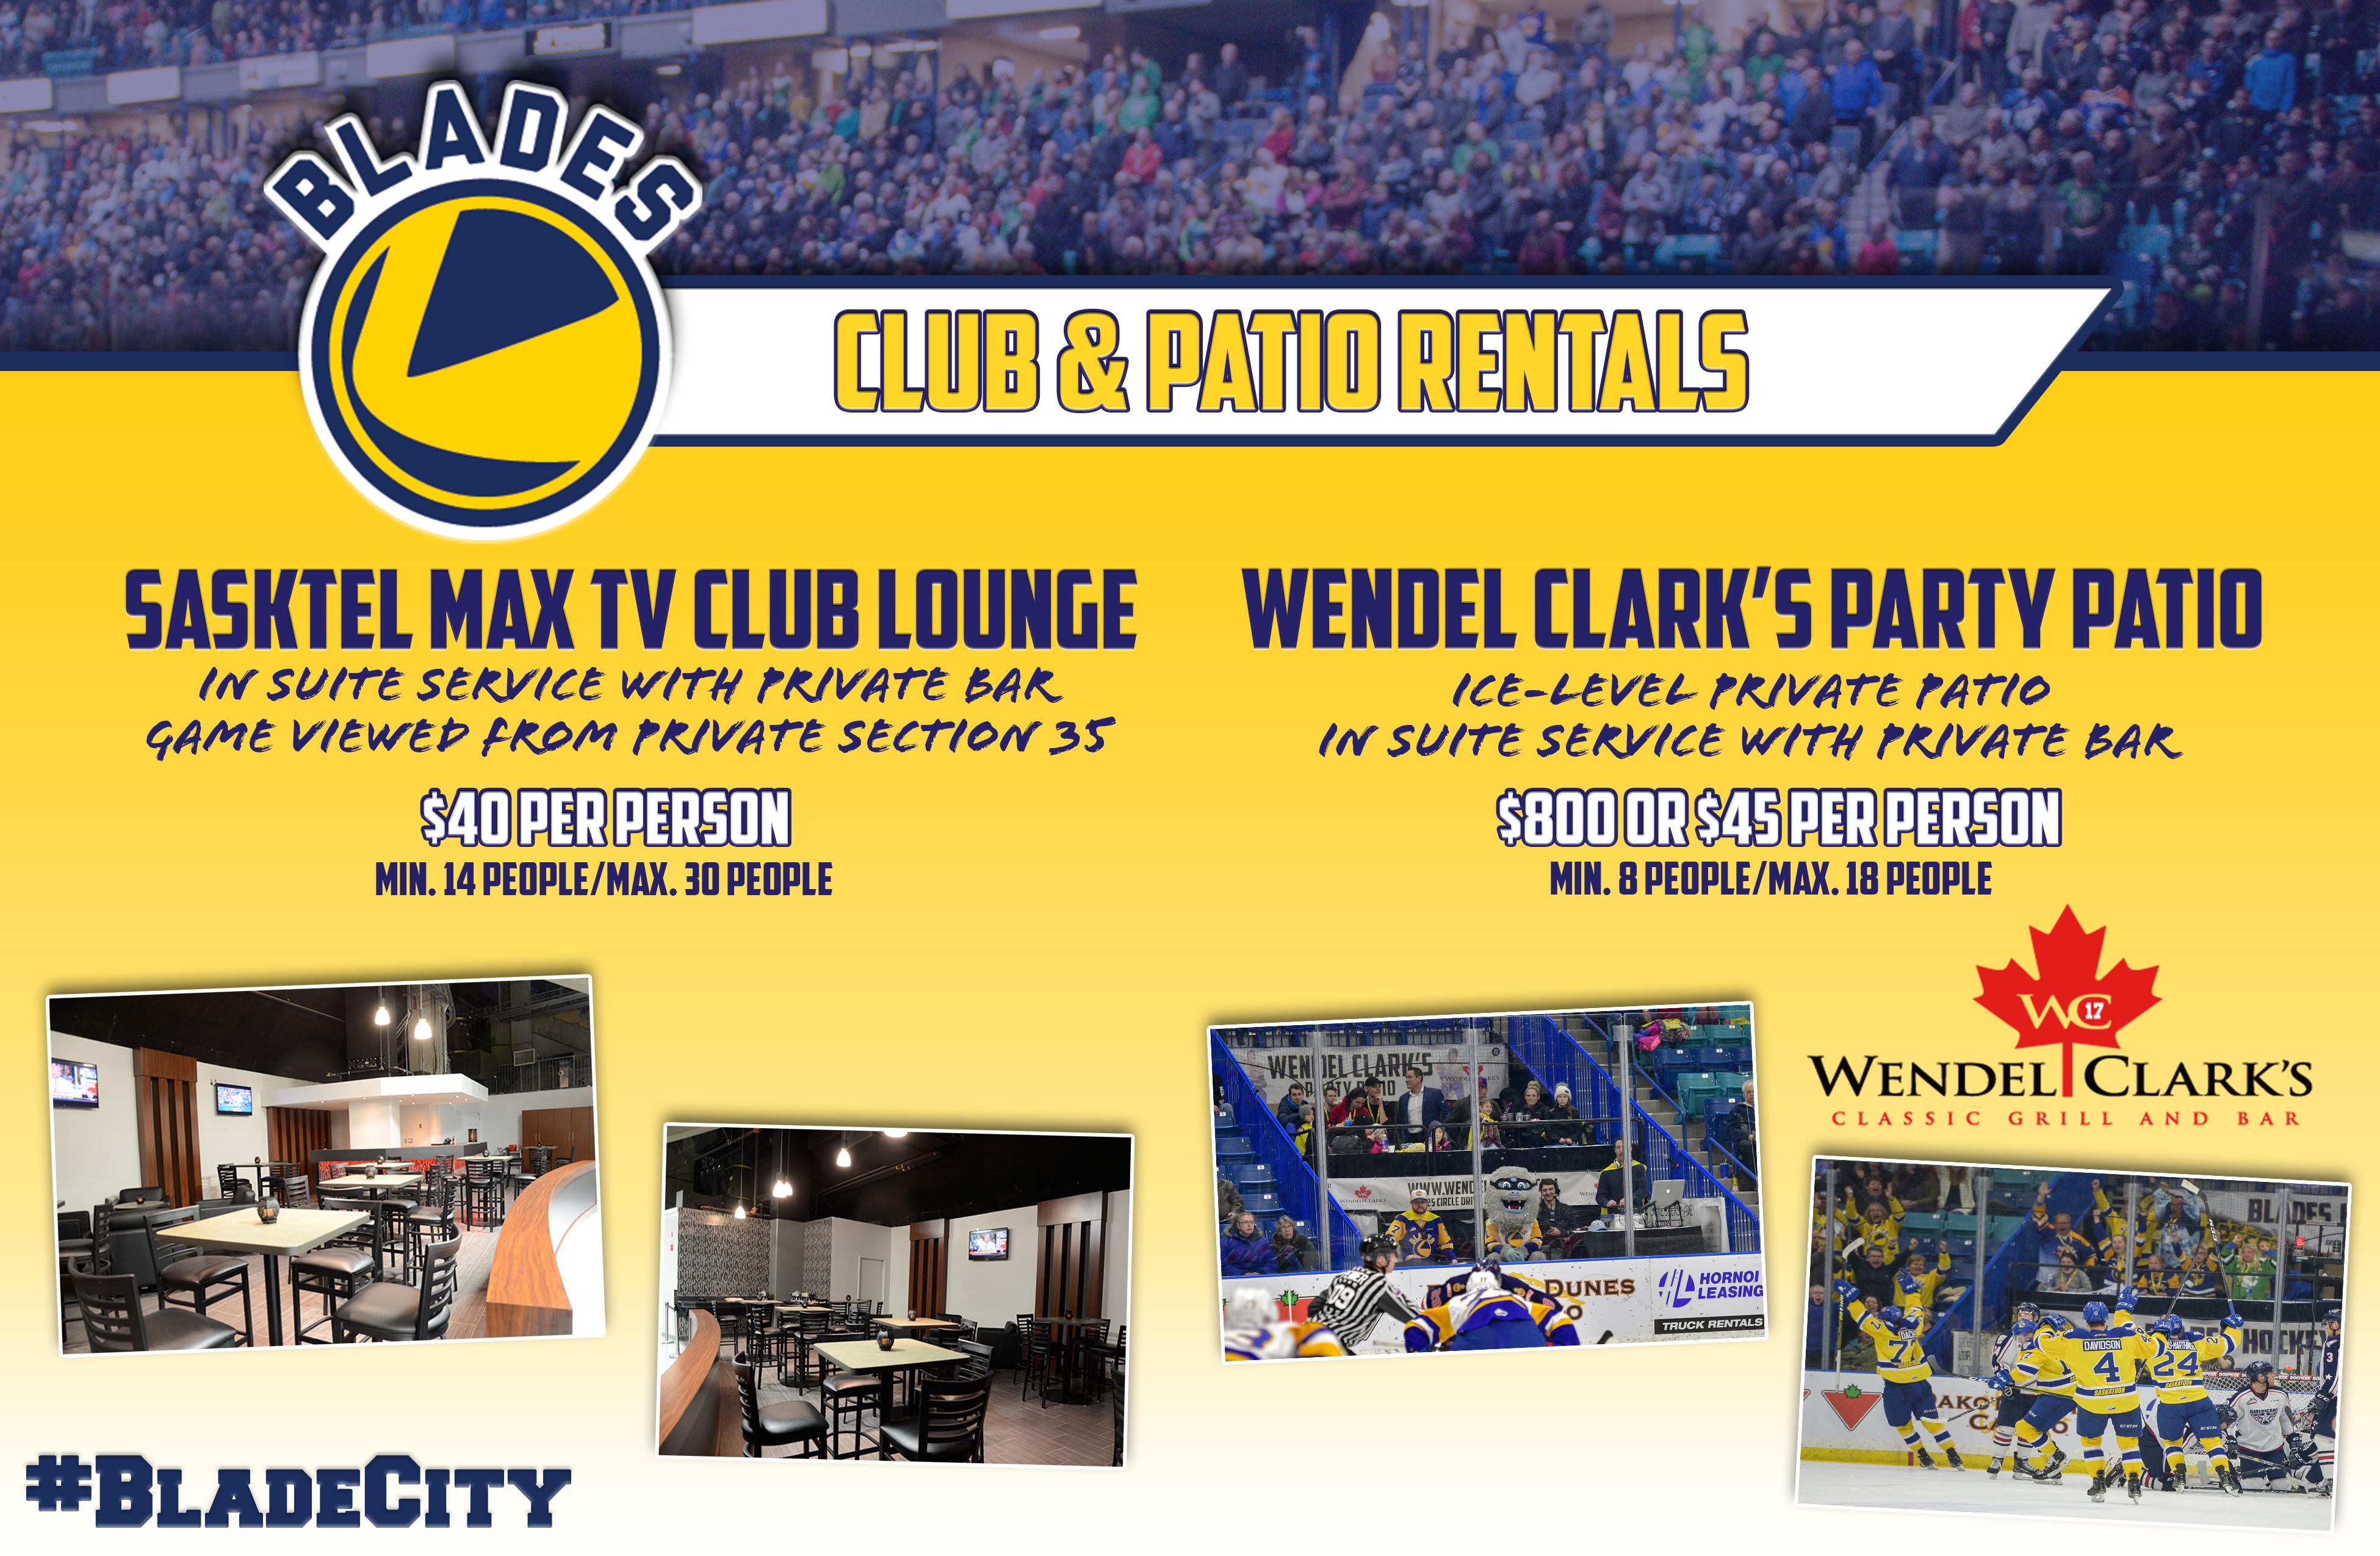 Club & Patio - updated